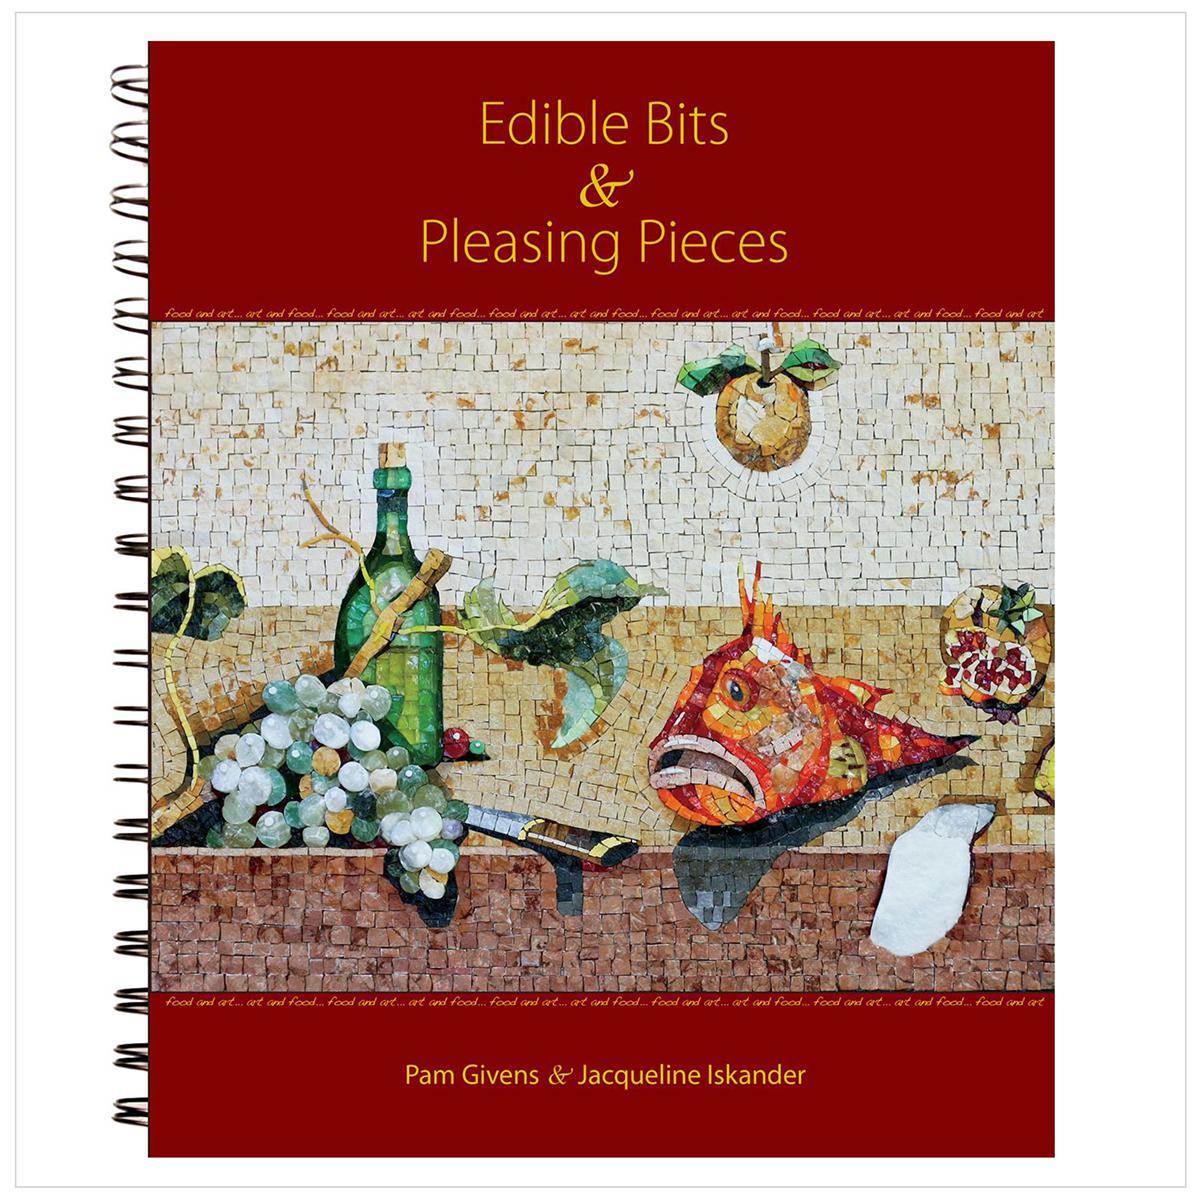 Edible Bits & Pleasing Pieces